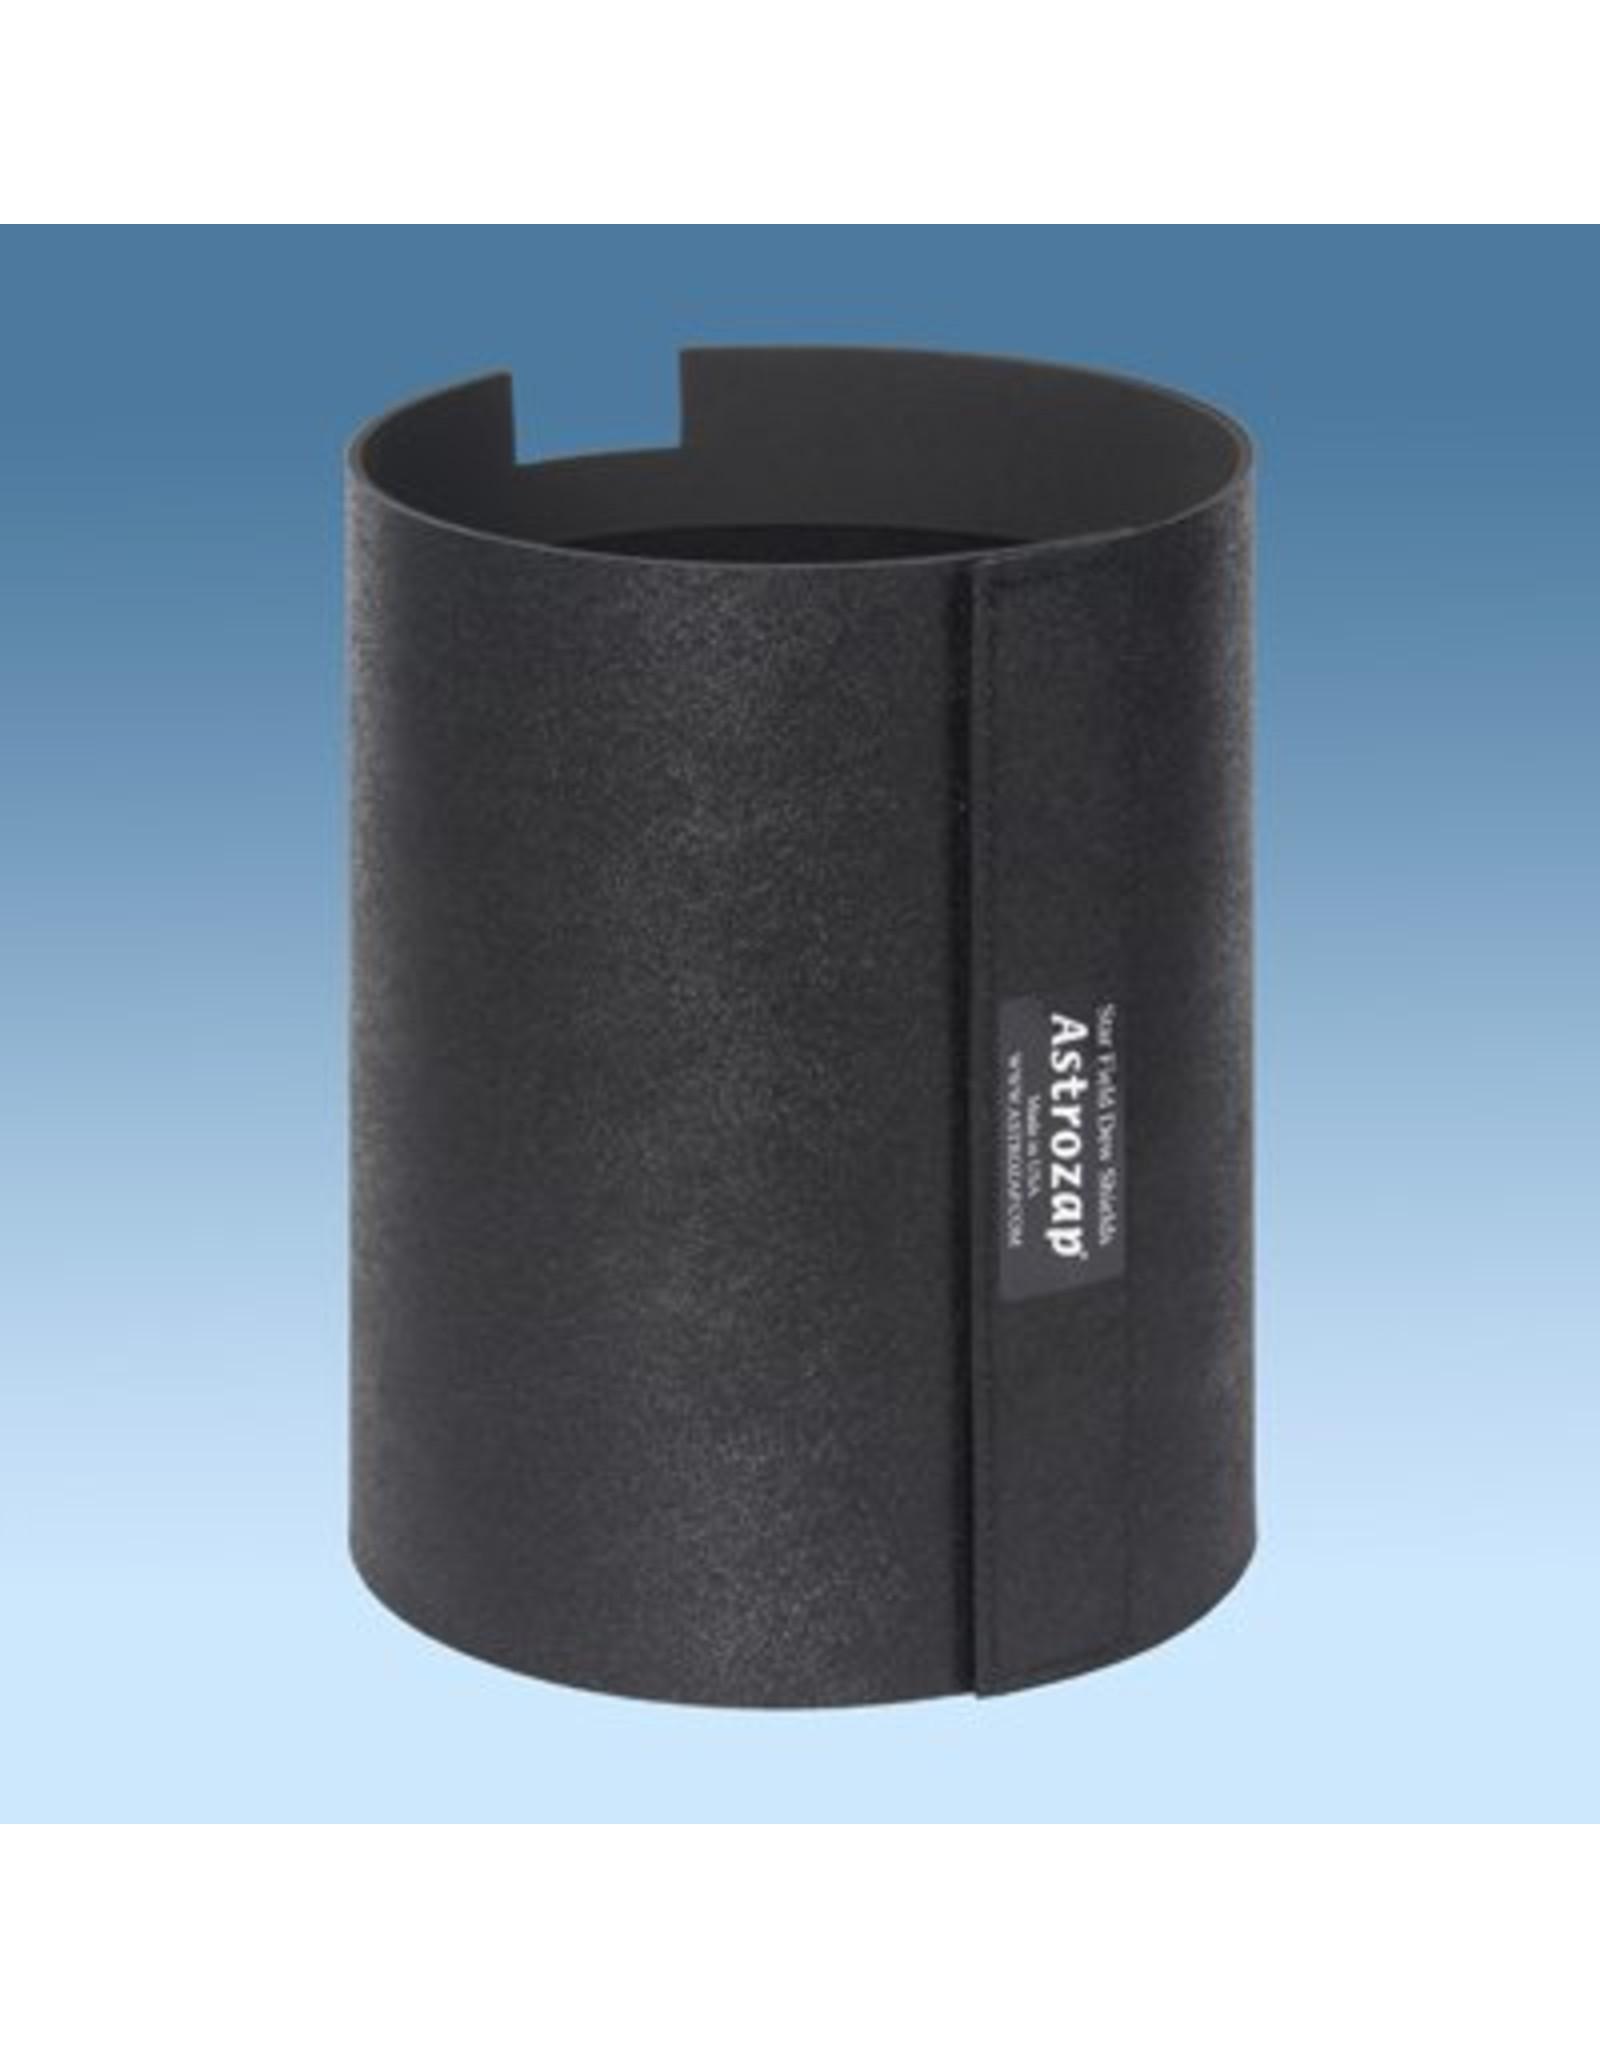 Astrozap Celestron 8 SCT Flexi-Shield™ Flexible Dew Shield - with Side Bar Notch